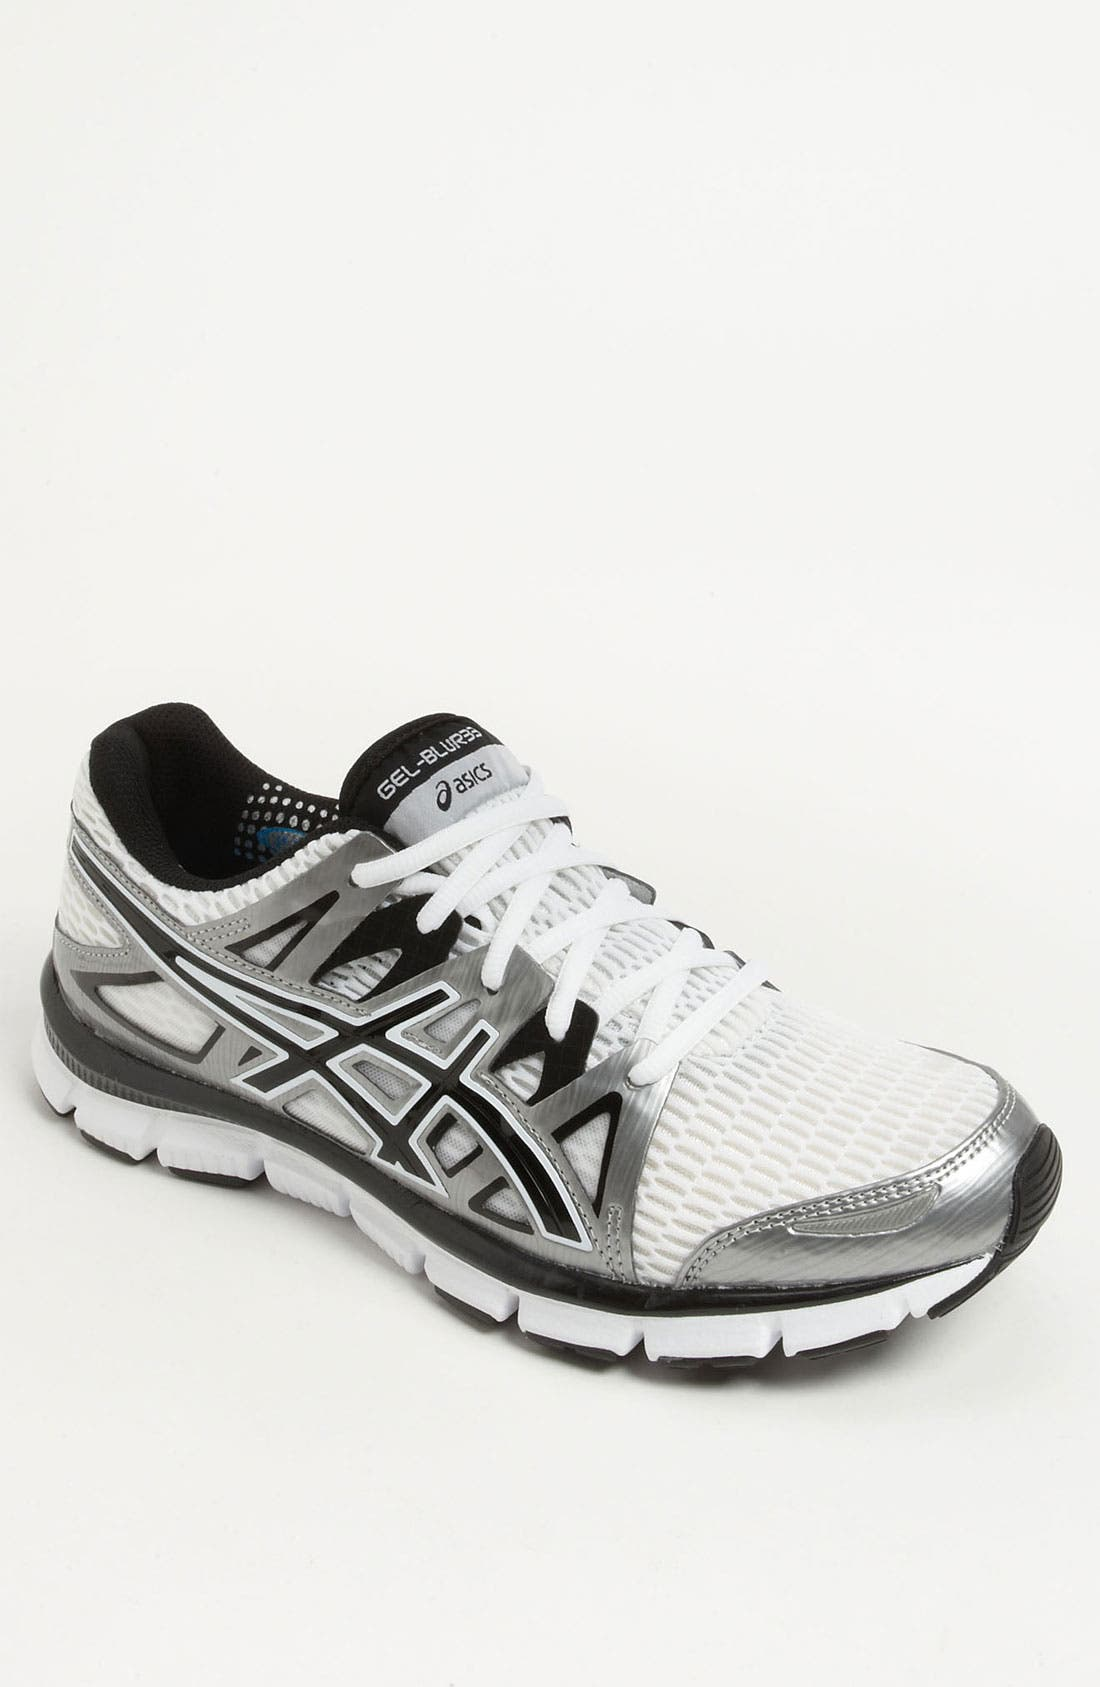 Alternate Image 1 Selected - ASICS® 'GEL-Blur 33 2.0' Running Shoe (Men)